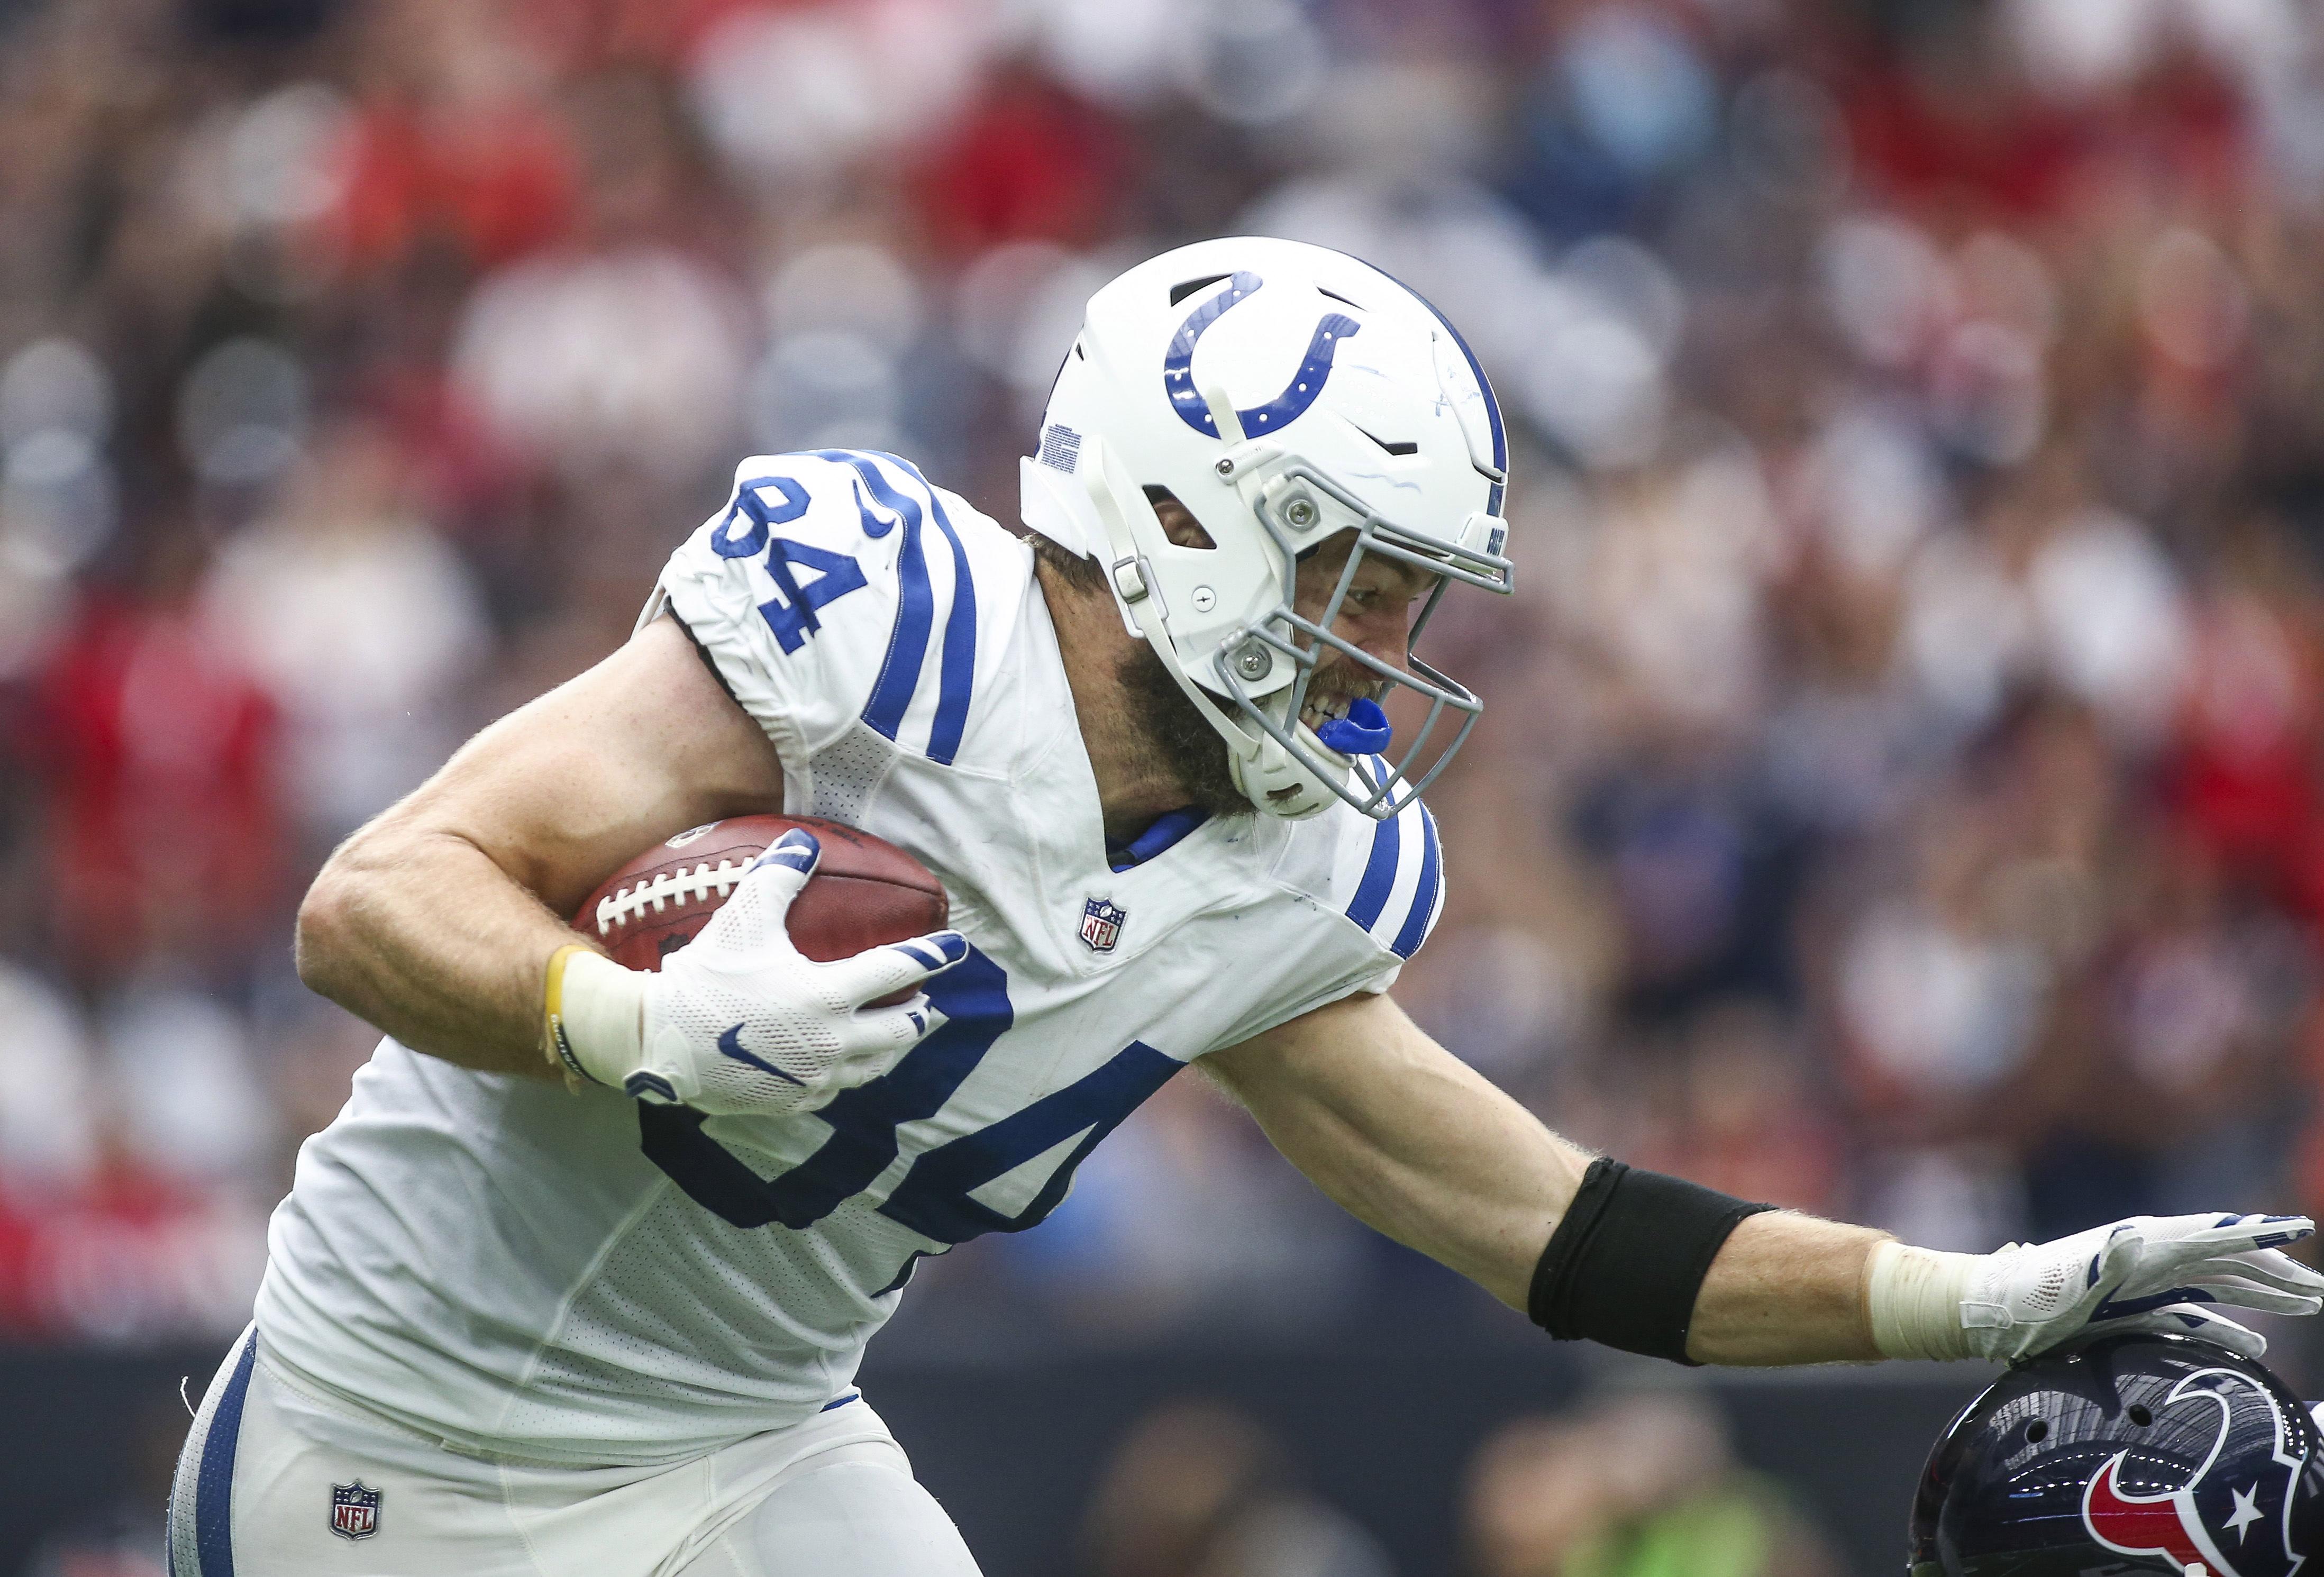 NFL: Indianapolis Colts at Houston Texans